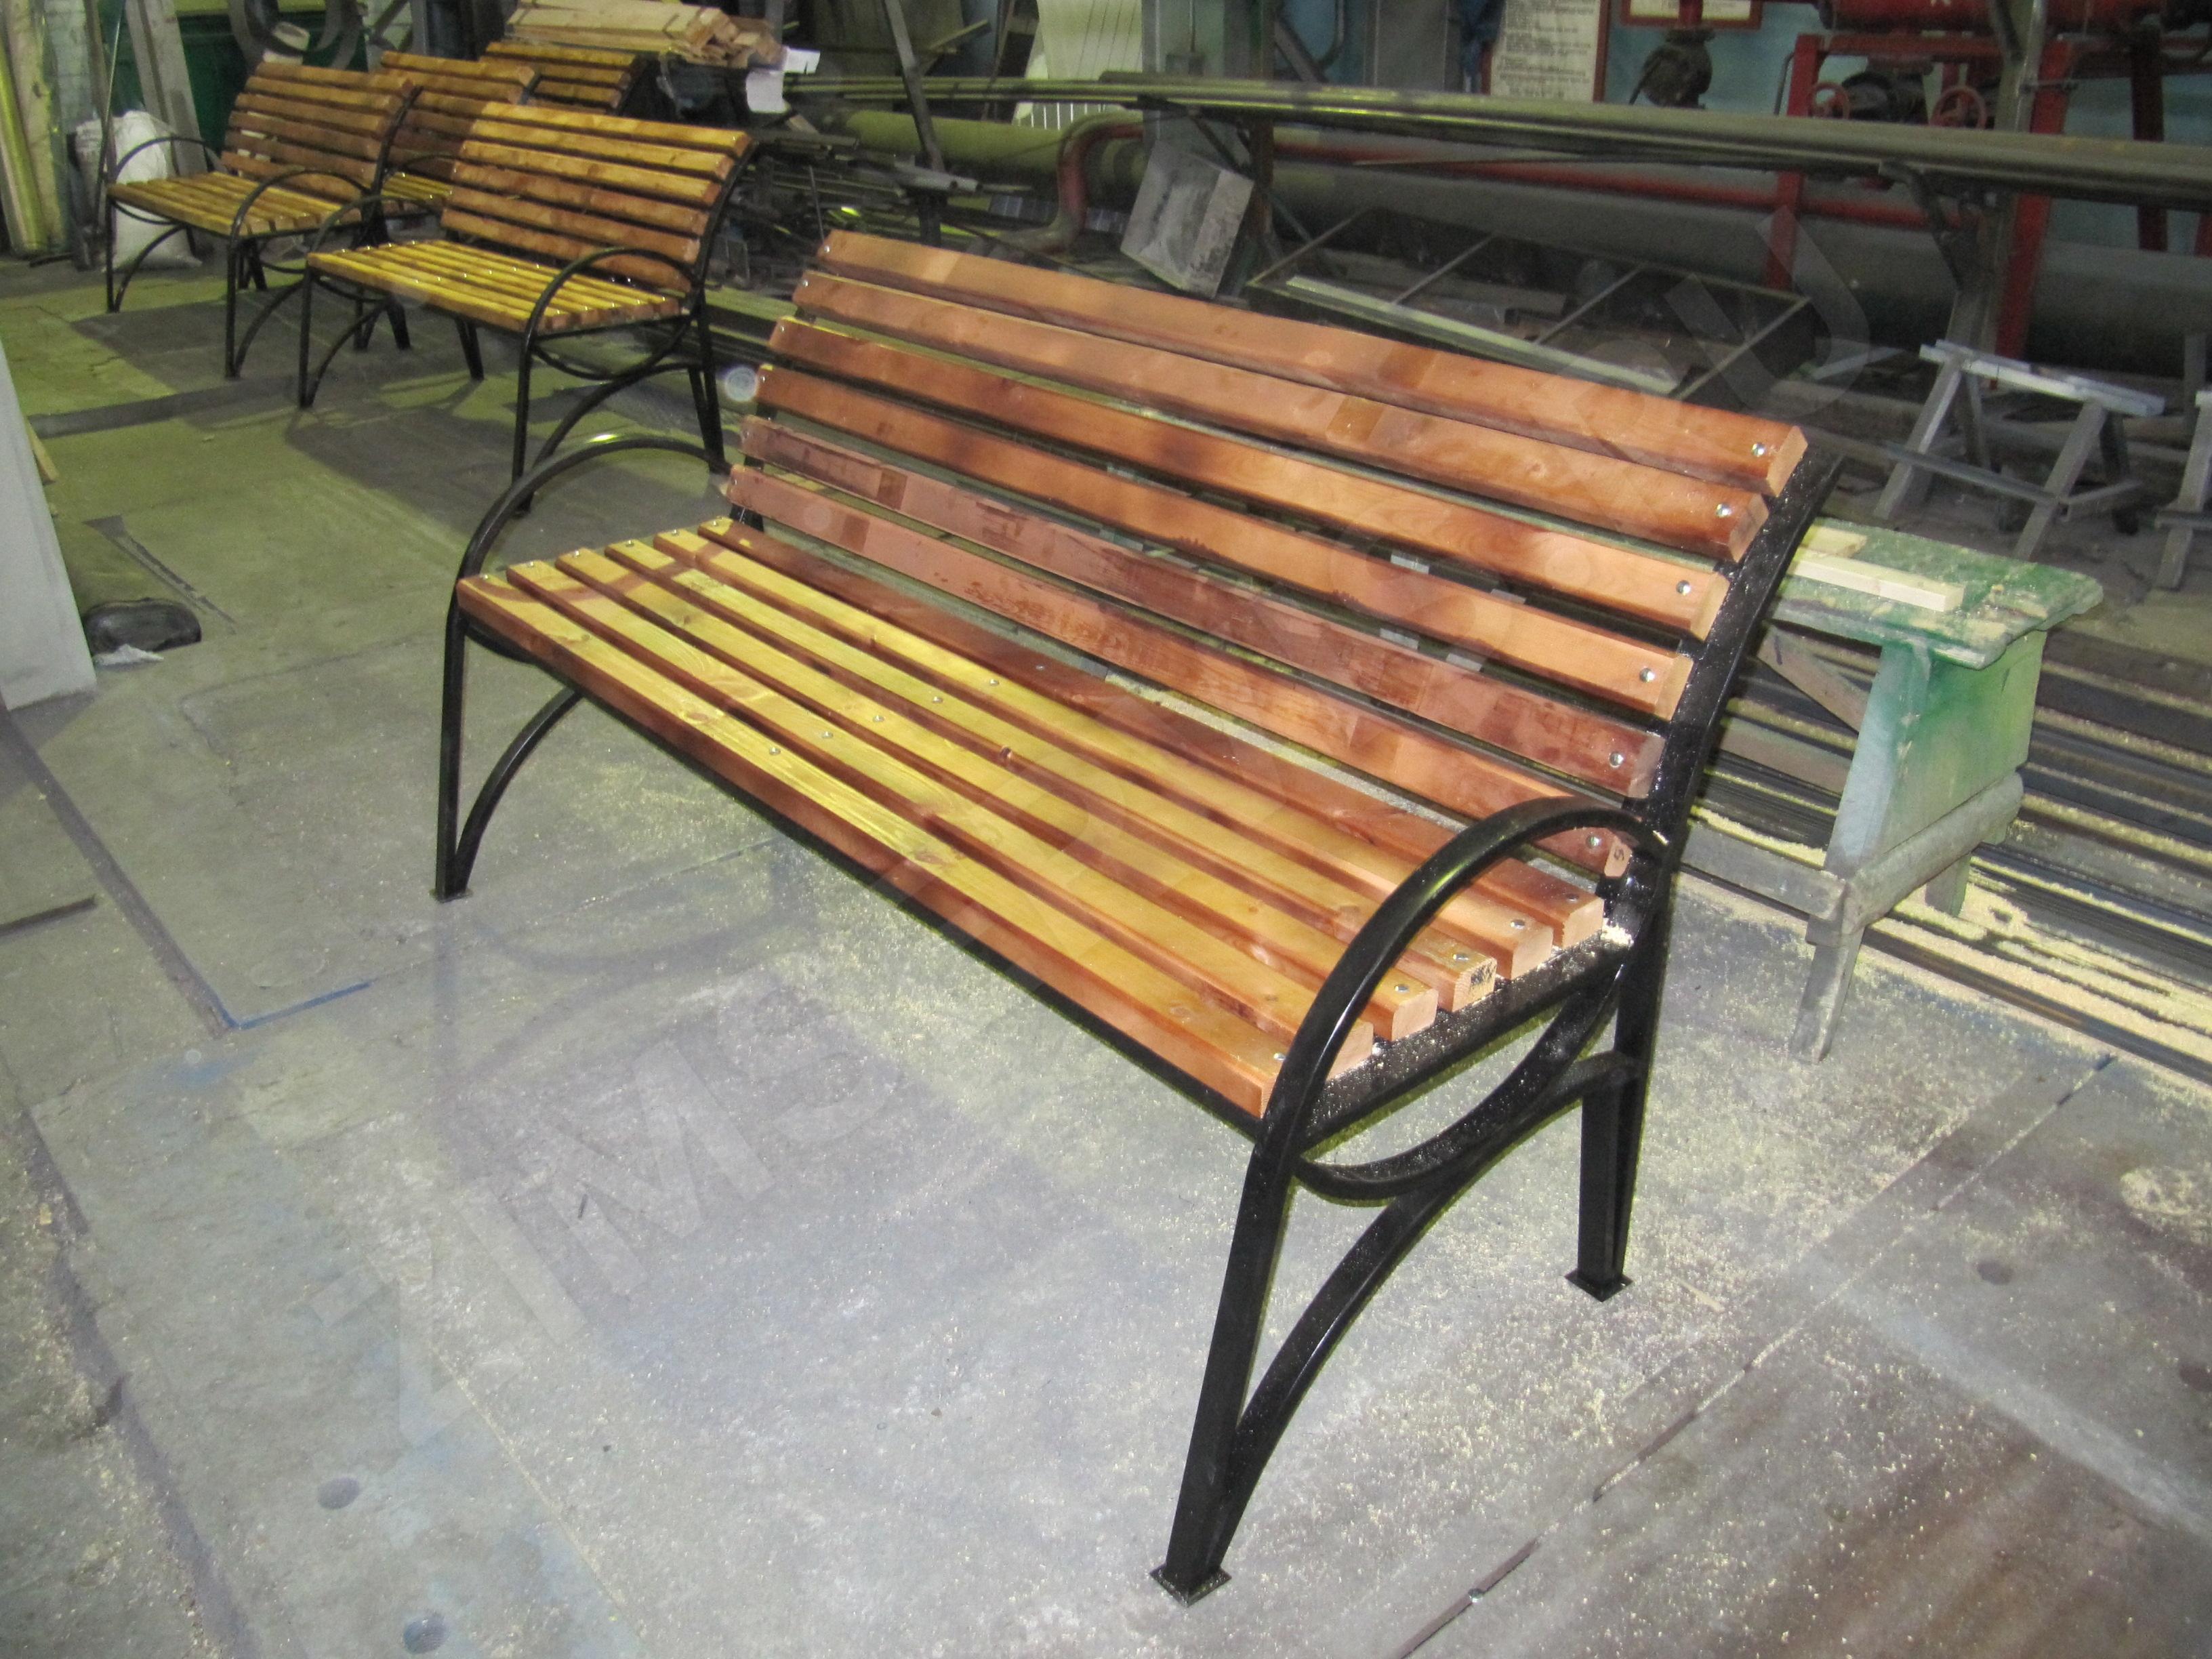 Скамейка своими руками с металлическим основанием фото 45